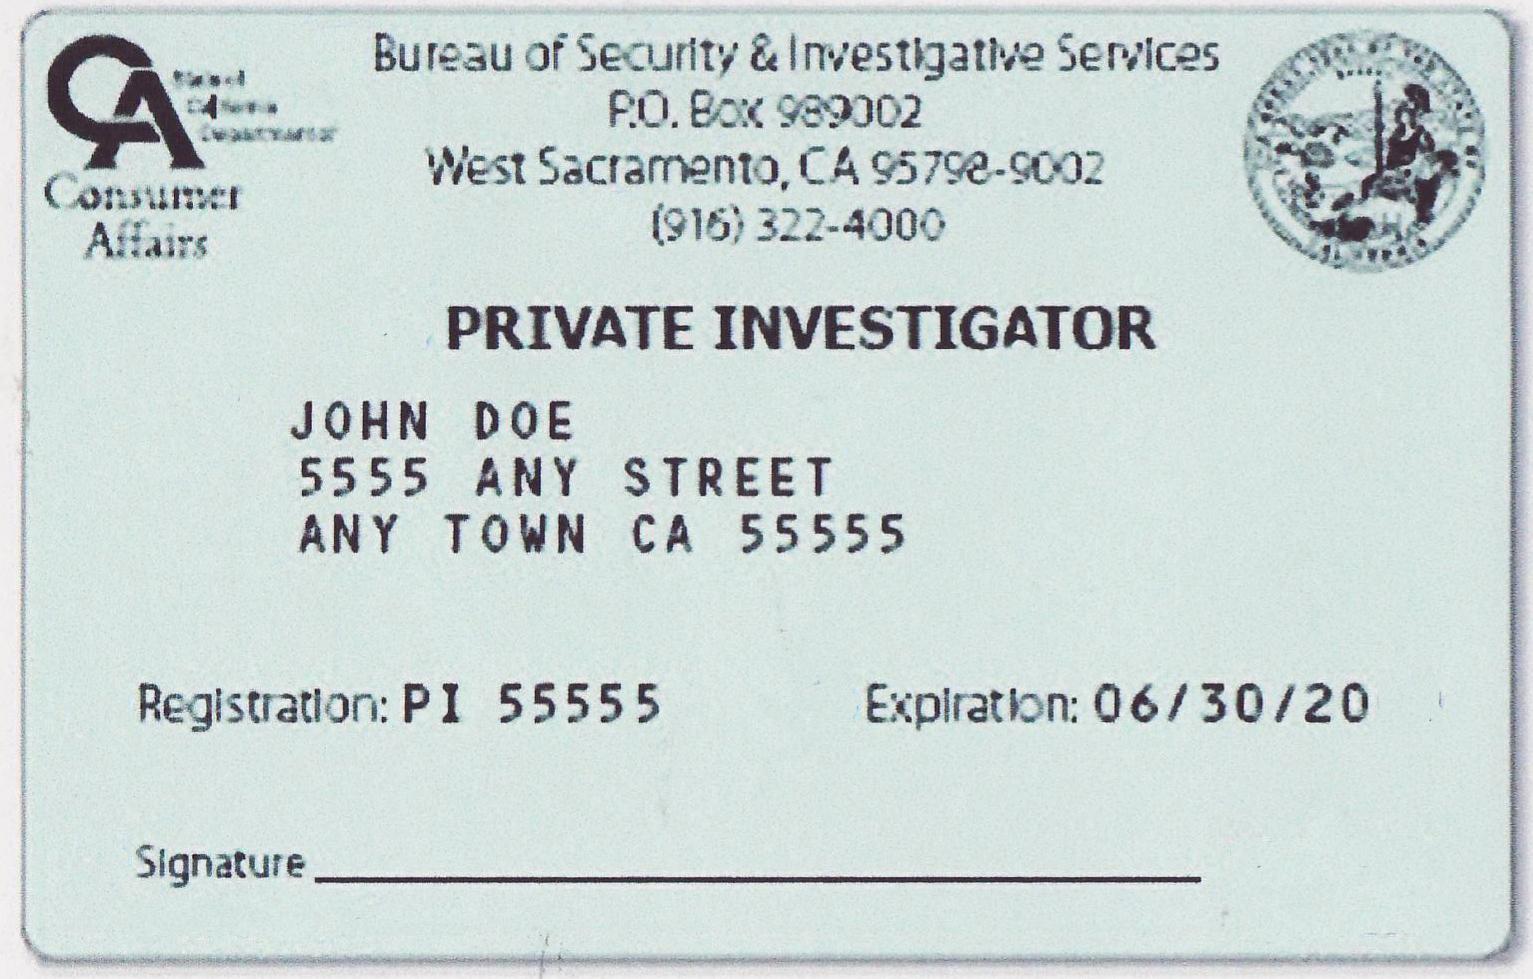 California private investigator pi license test california private investigator study material and practice tests california pi license test at 1betcityfo Choice Image